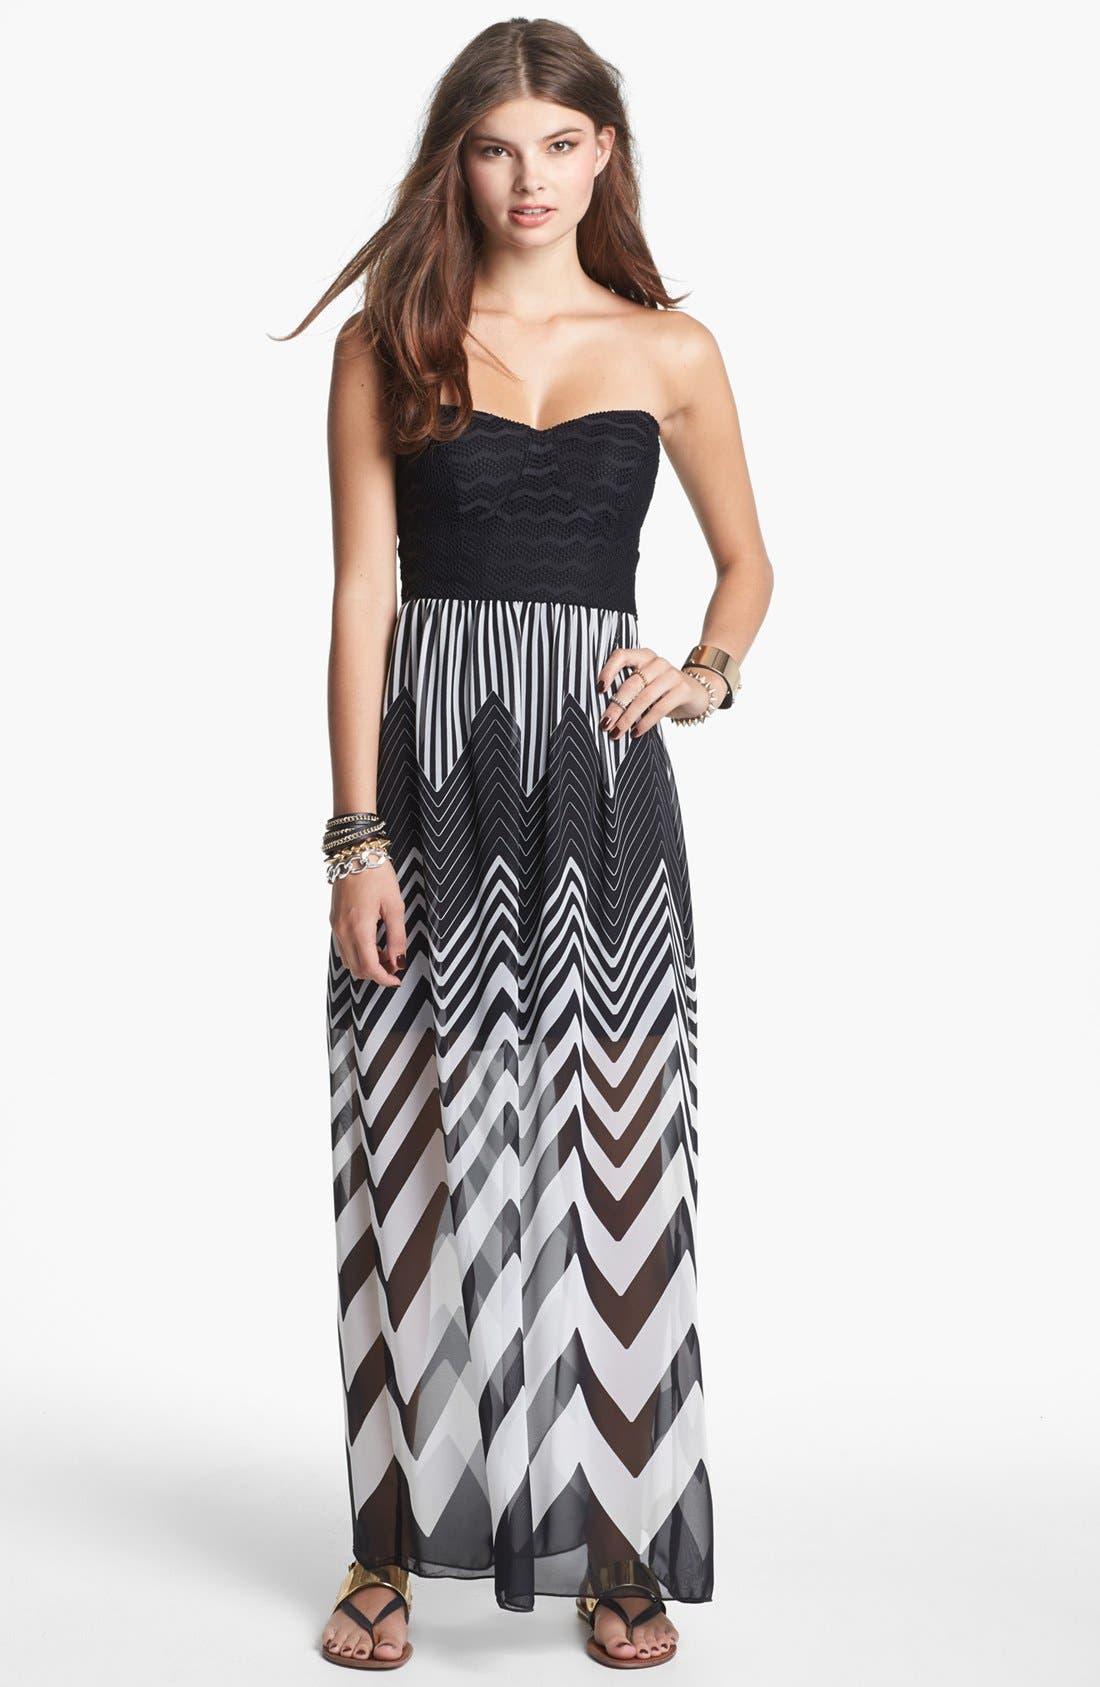 Alternate Image 1 Selected - Trixxi Strapless Chiffon Maxi Dress (Juniors) (Online Only)